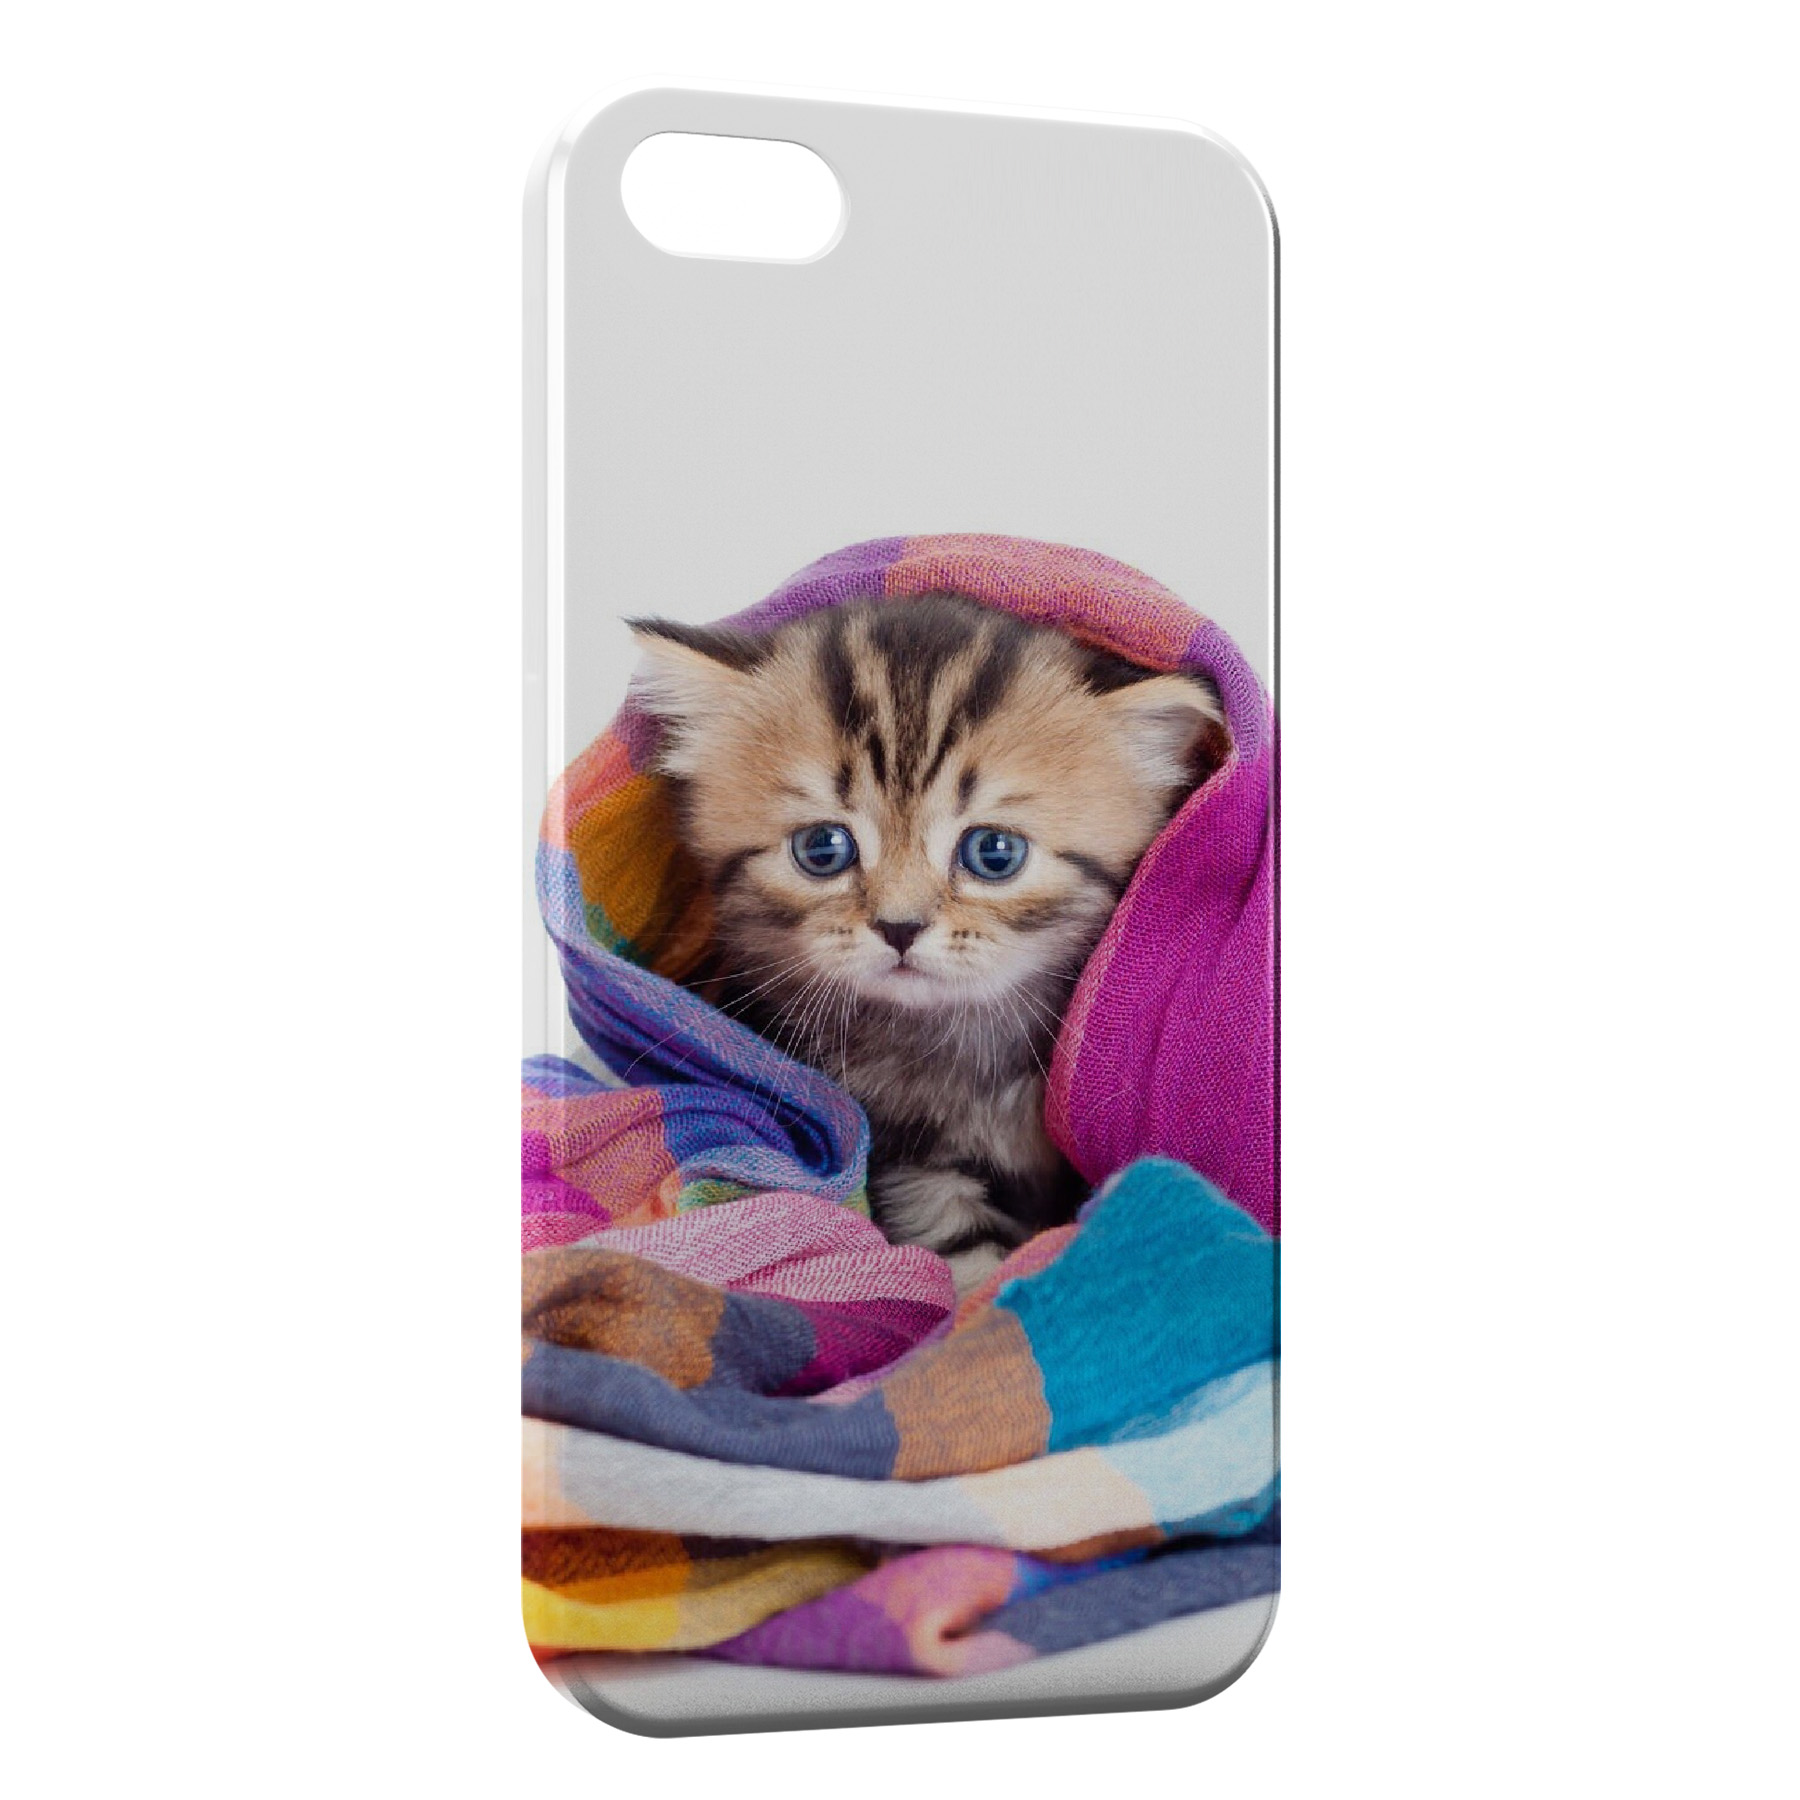 Coque iPhone 4 & 4S Chat Mignon Serviette